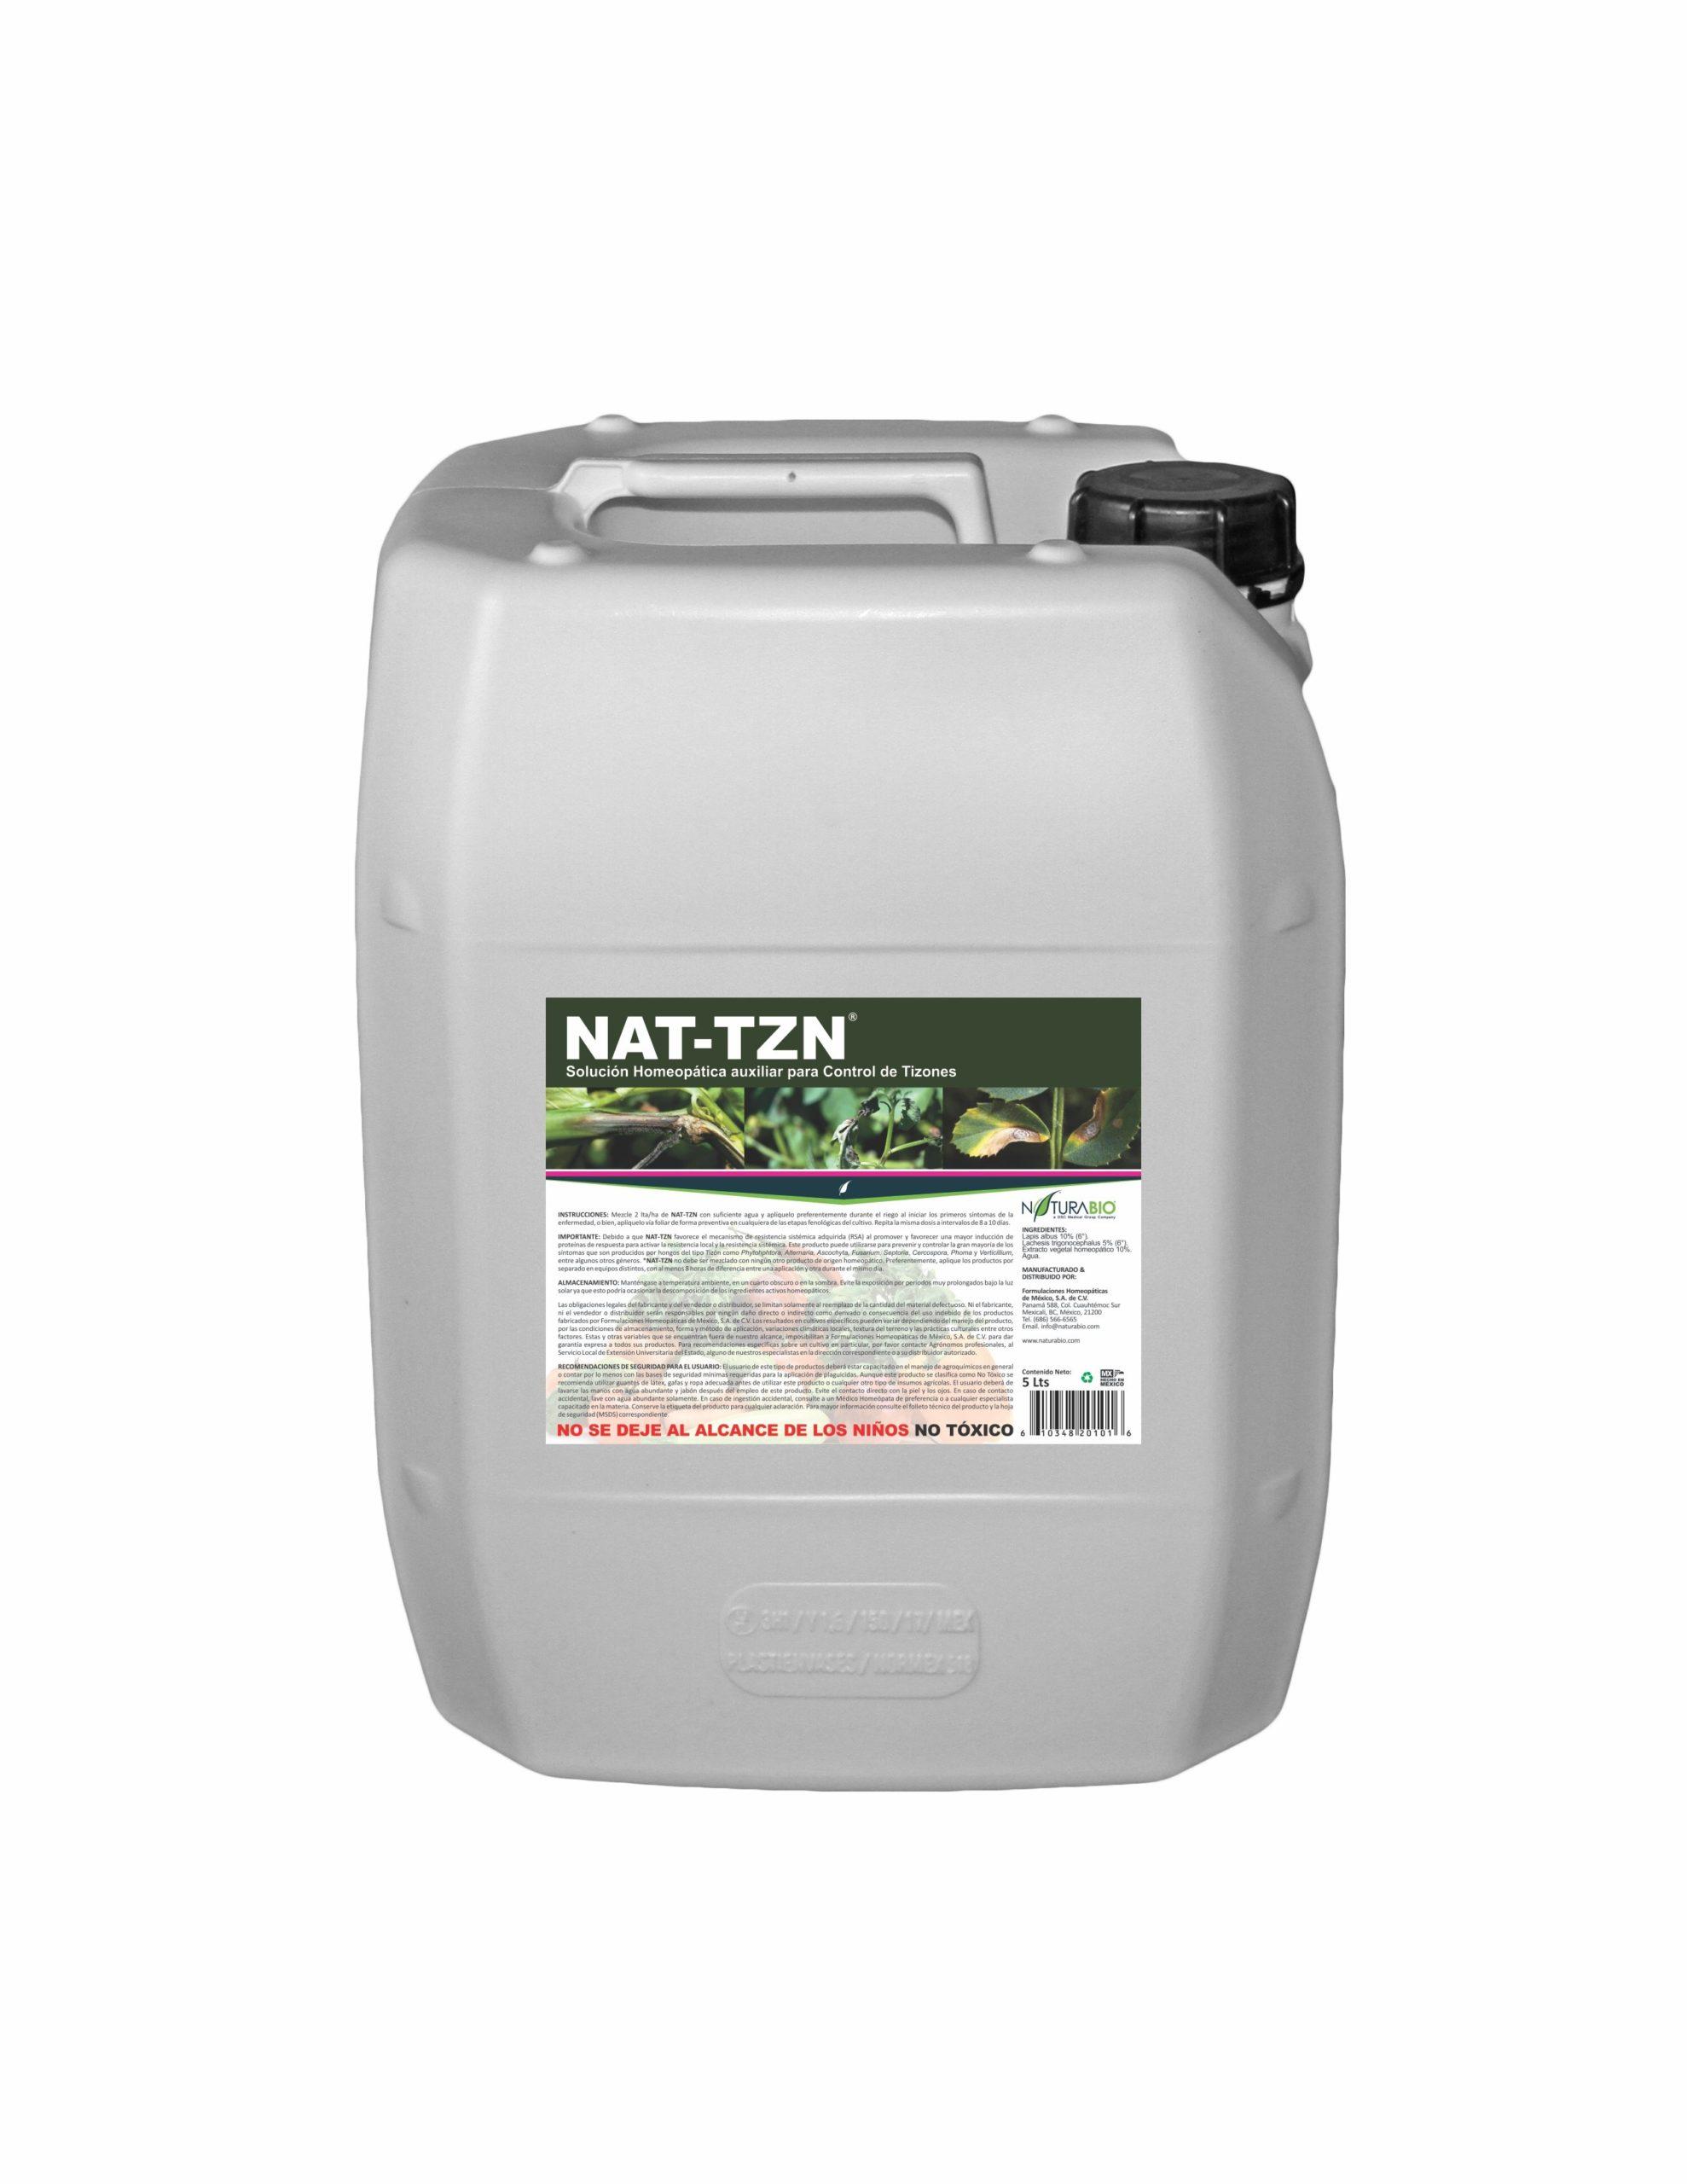 NAT-TZN Solución Homeopática auxiliar para Control de Tizones